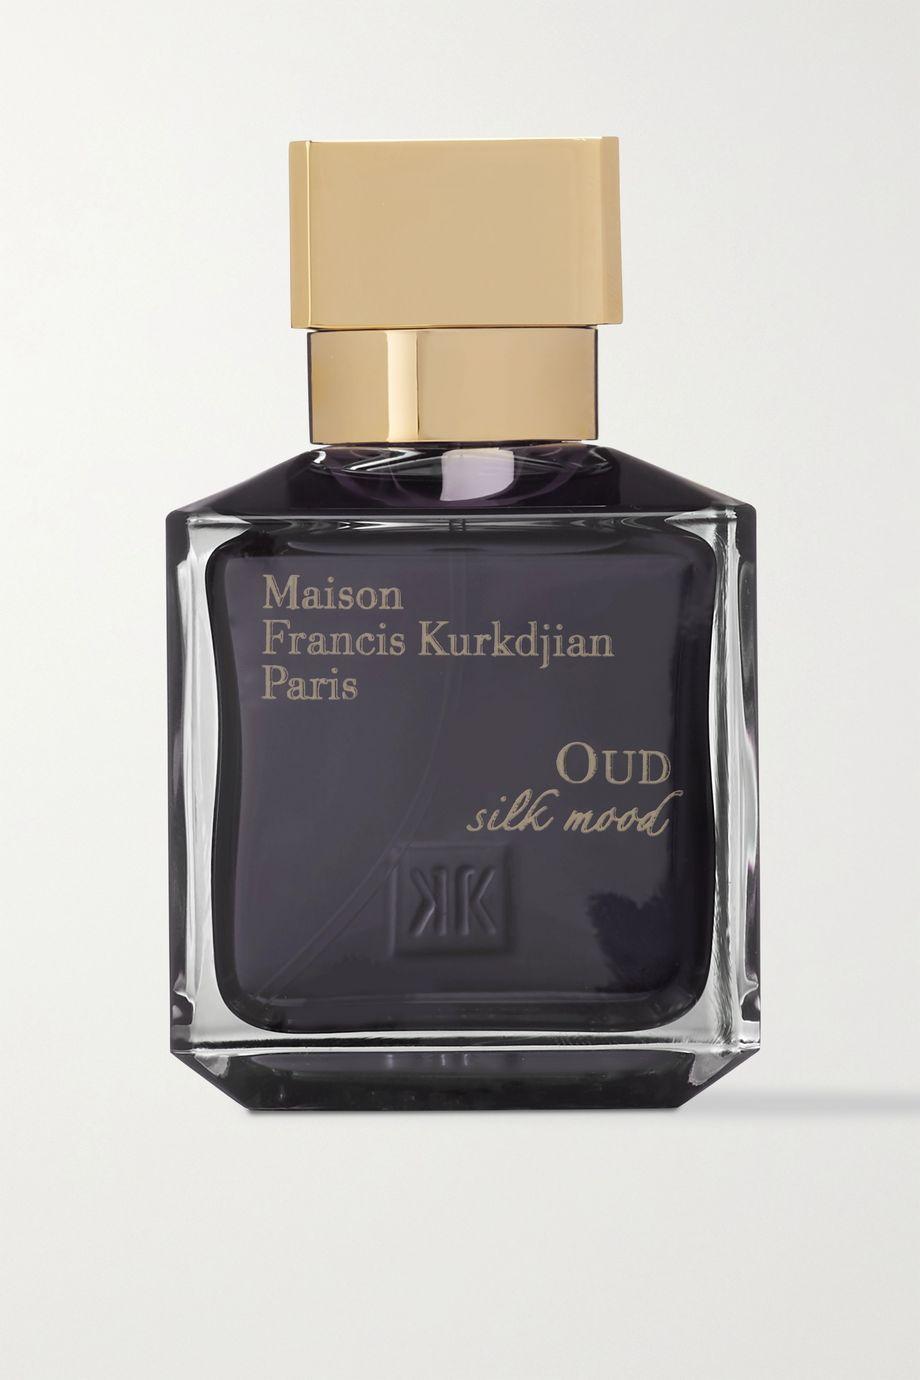 Maison Francis Kurkdjian Eau de Parfum - Oud Silk Mood, 70ml